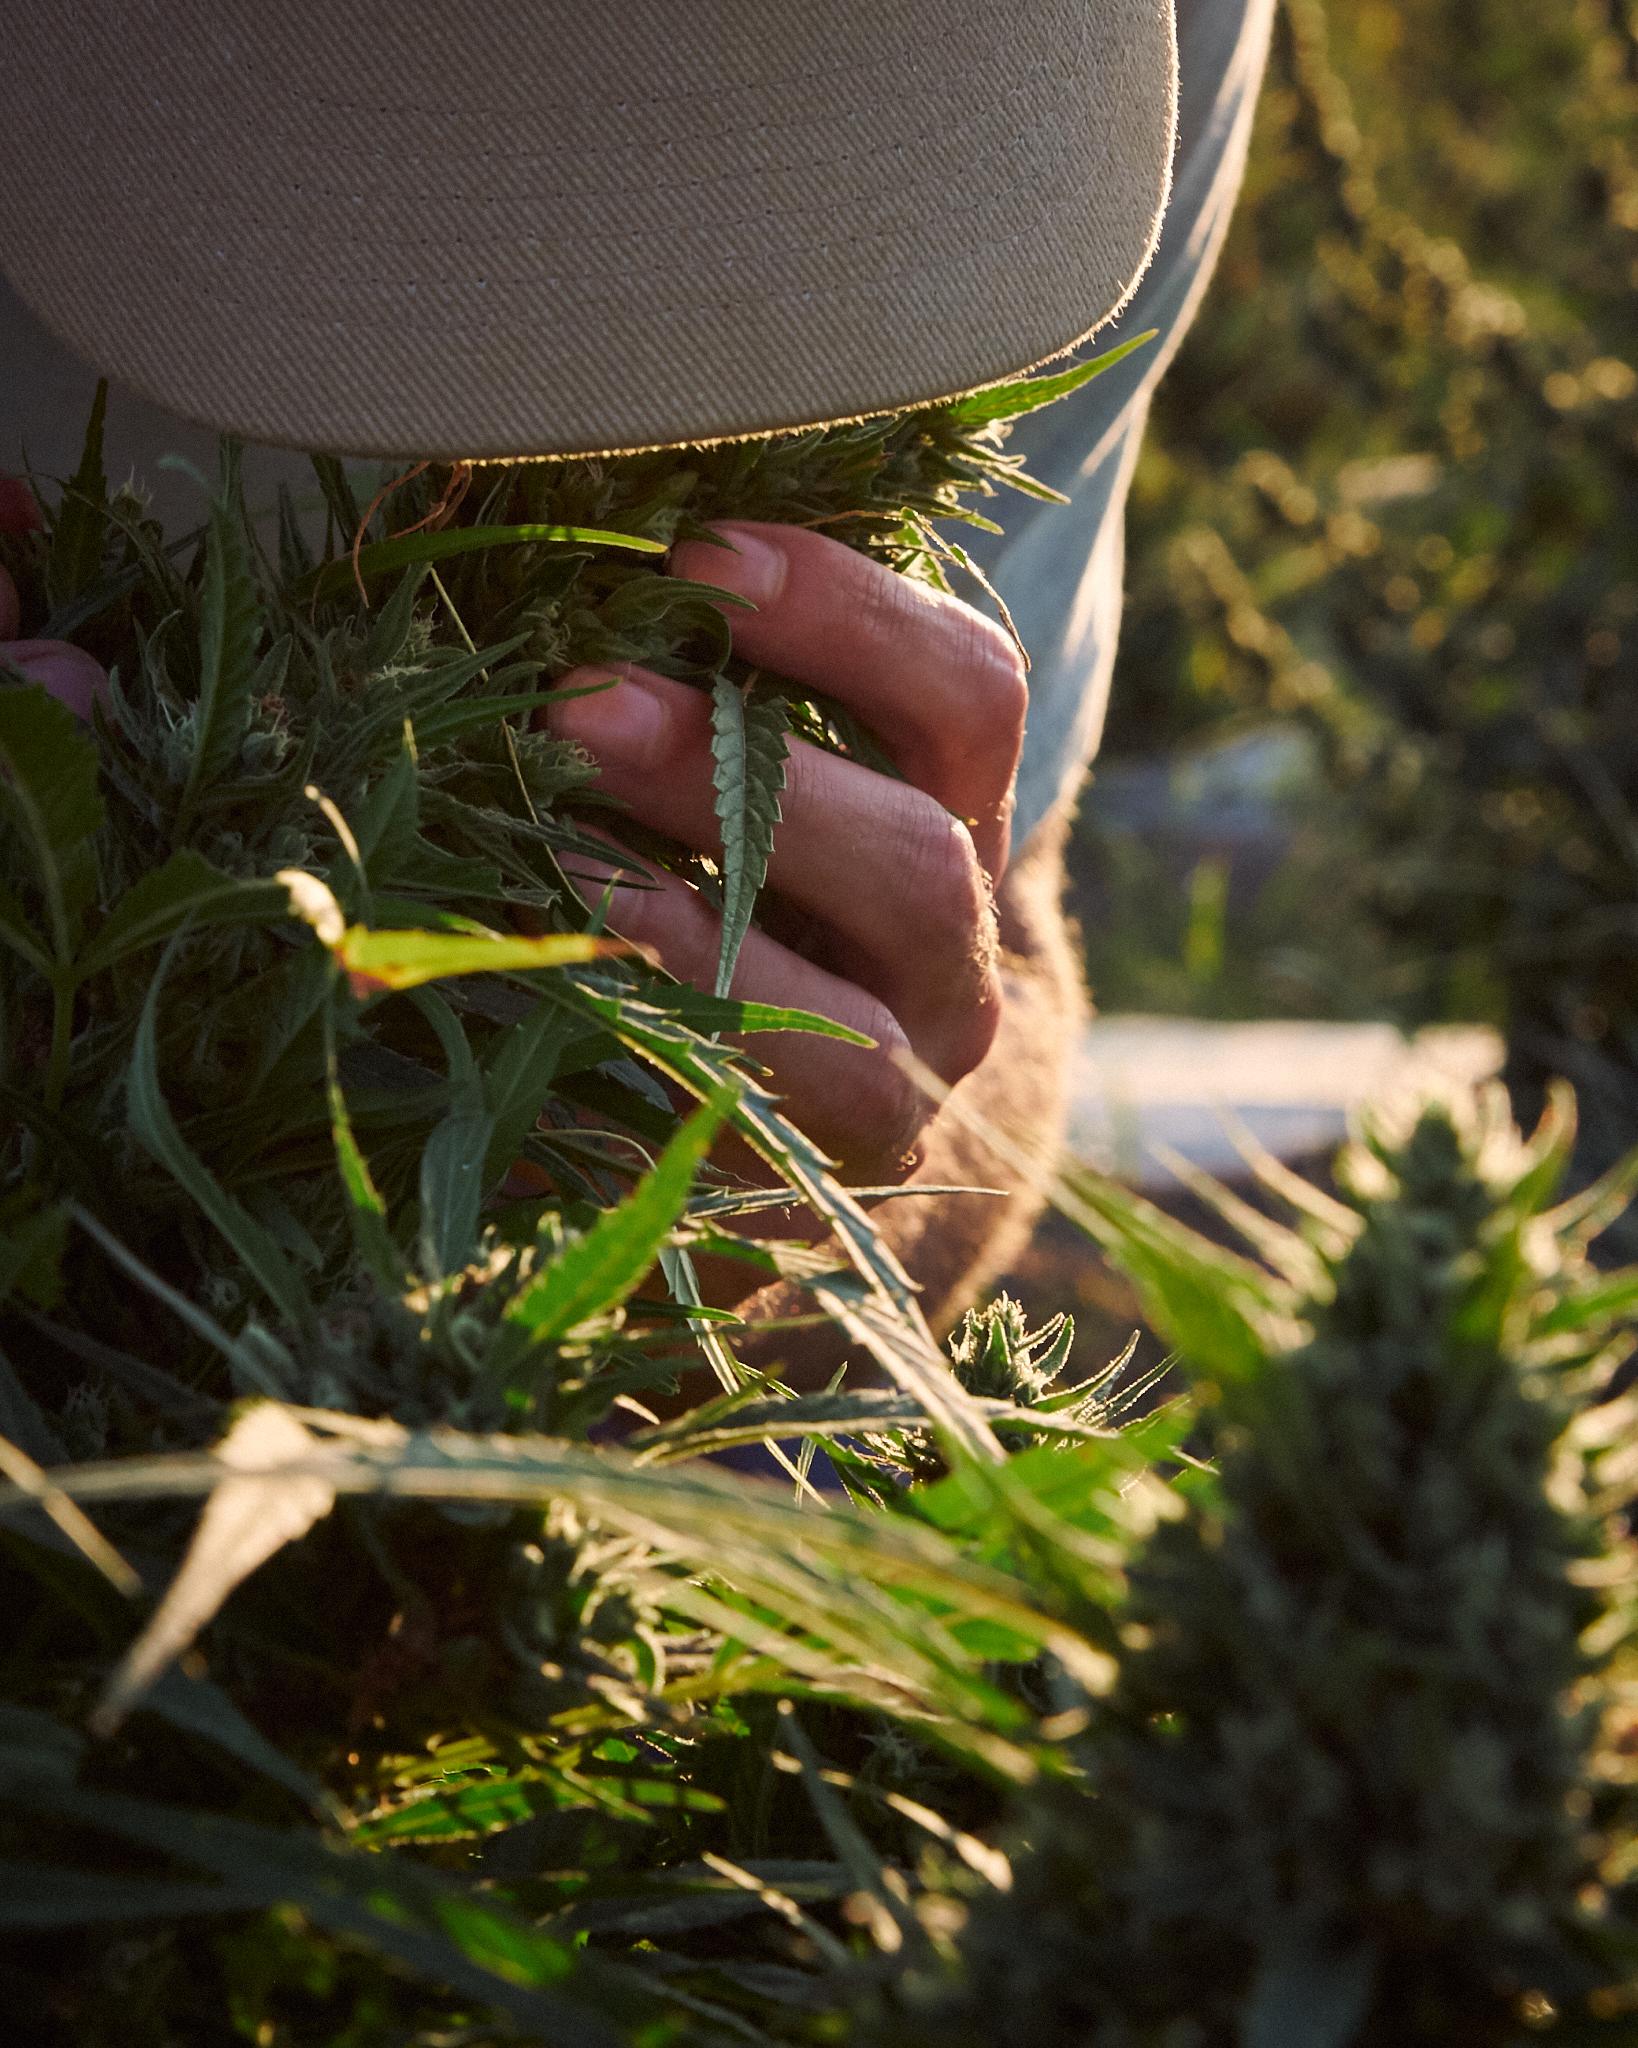 Farmer Smelling the Crop